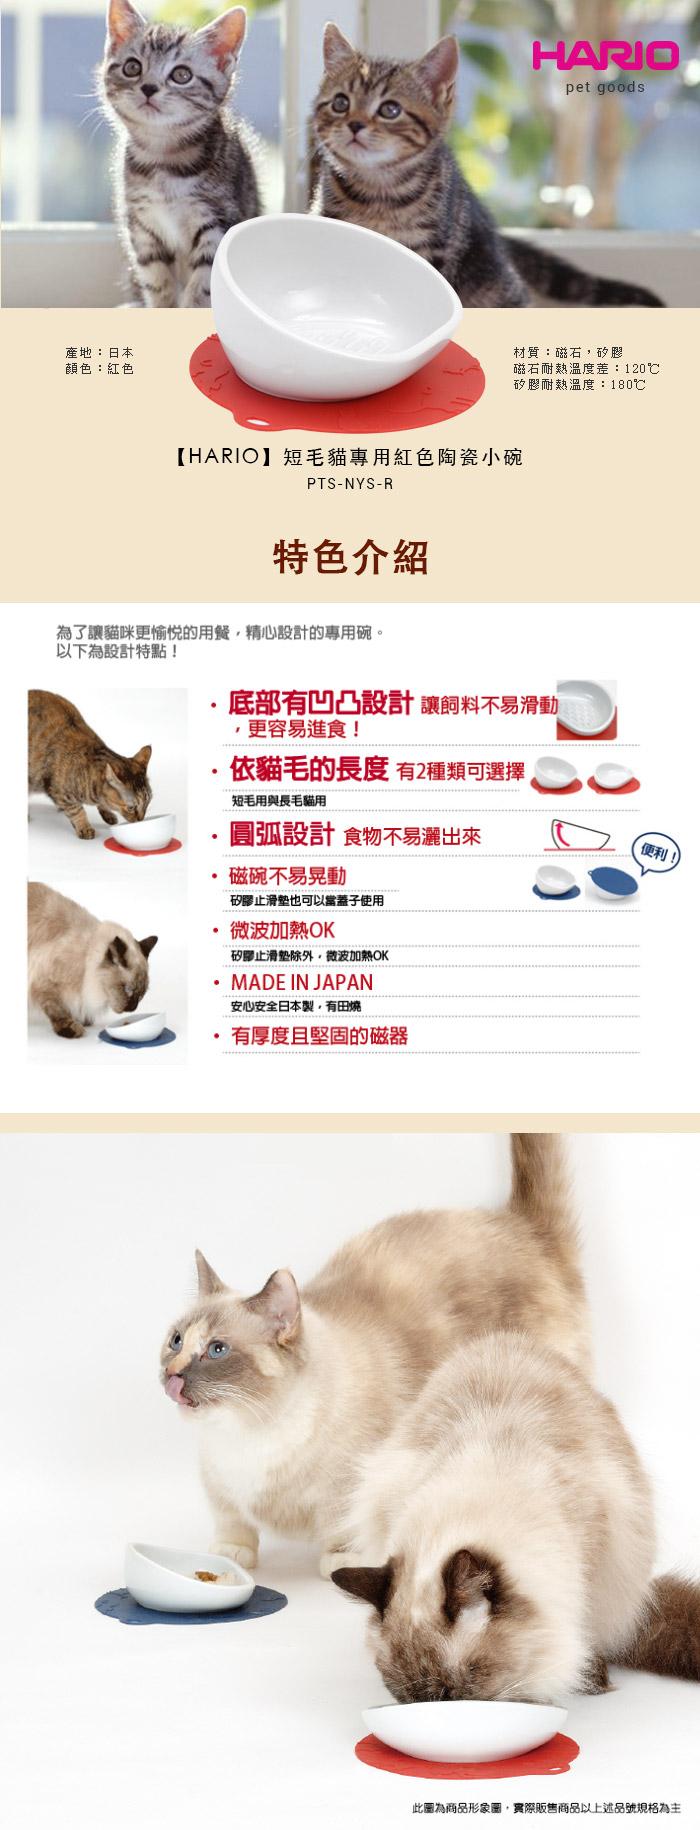 HARIO  短毛貓專用紅色陶瓷小碗  PTS-NYS-R